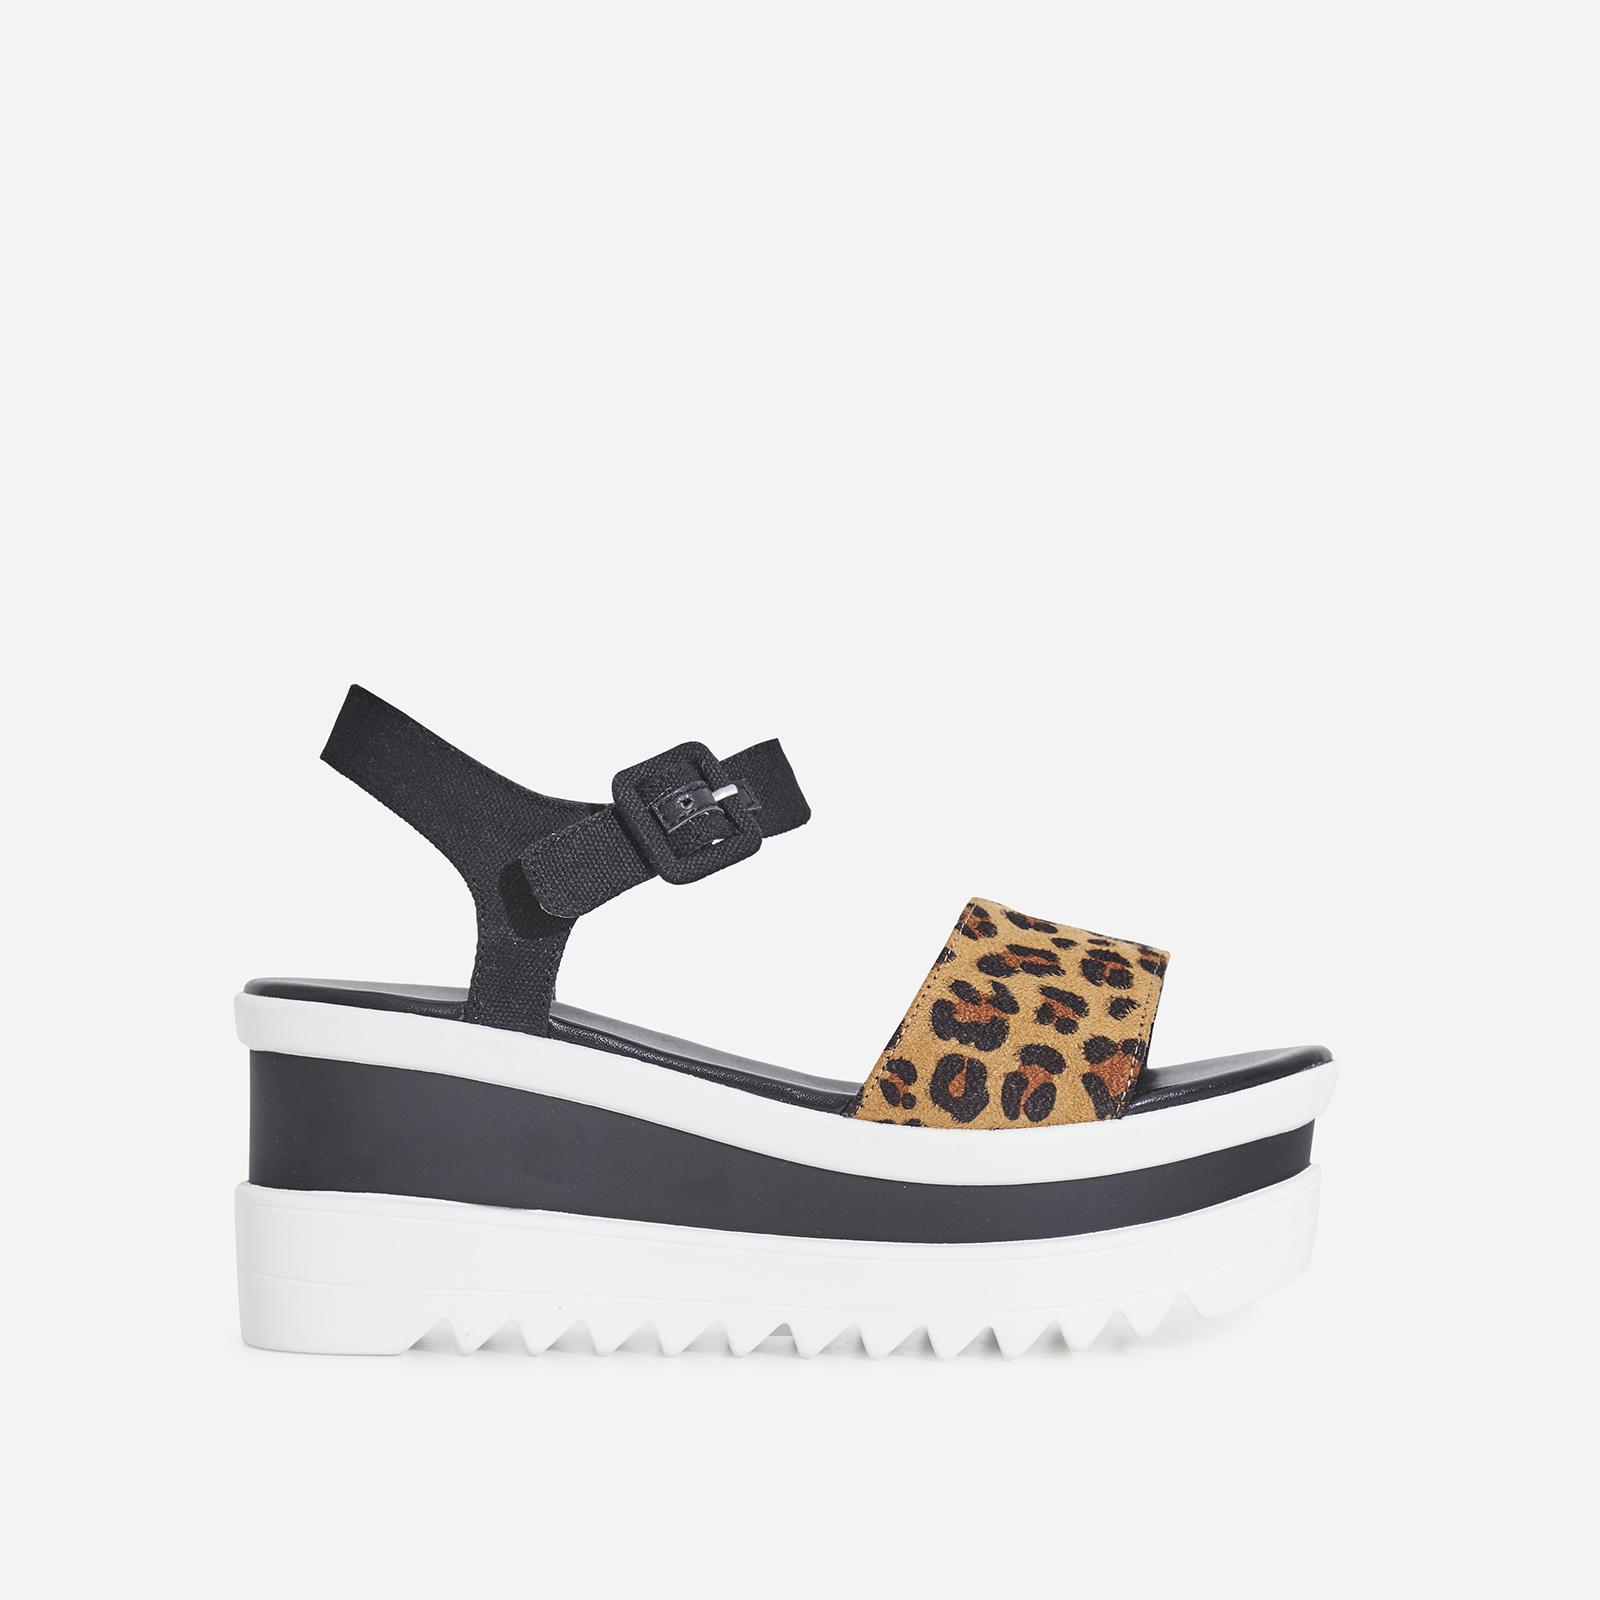 Perri Chunky Sole Sandal In Tan Leopard Print Faux Suede